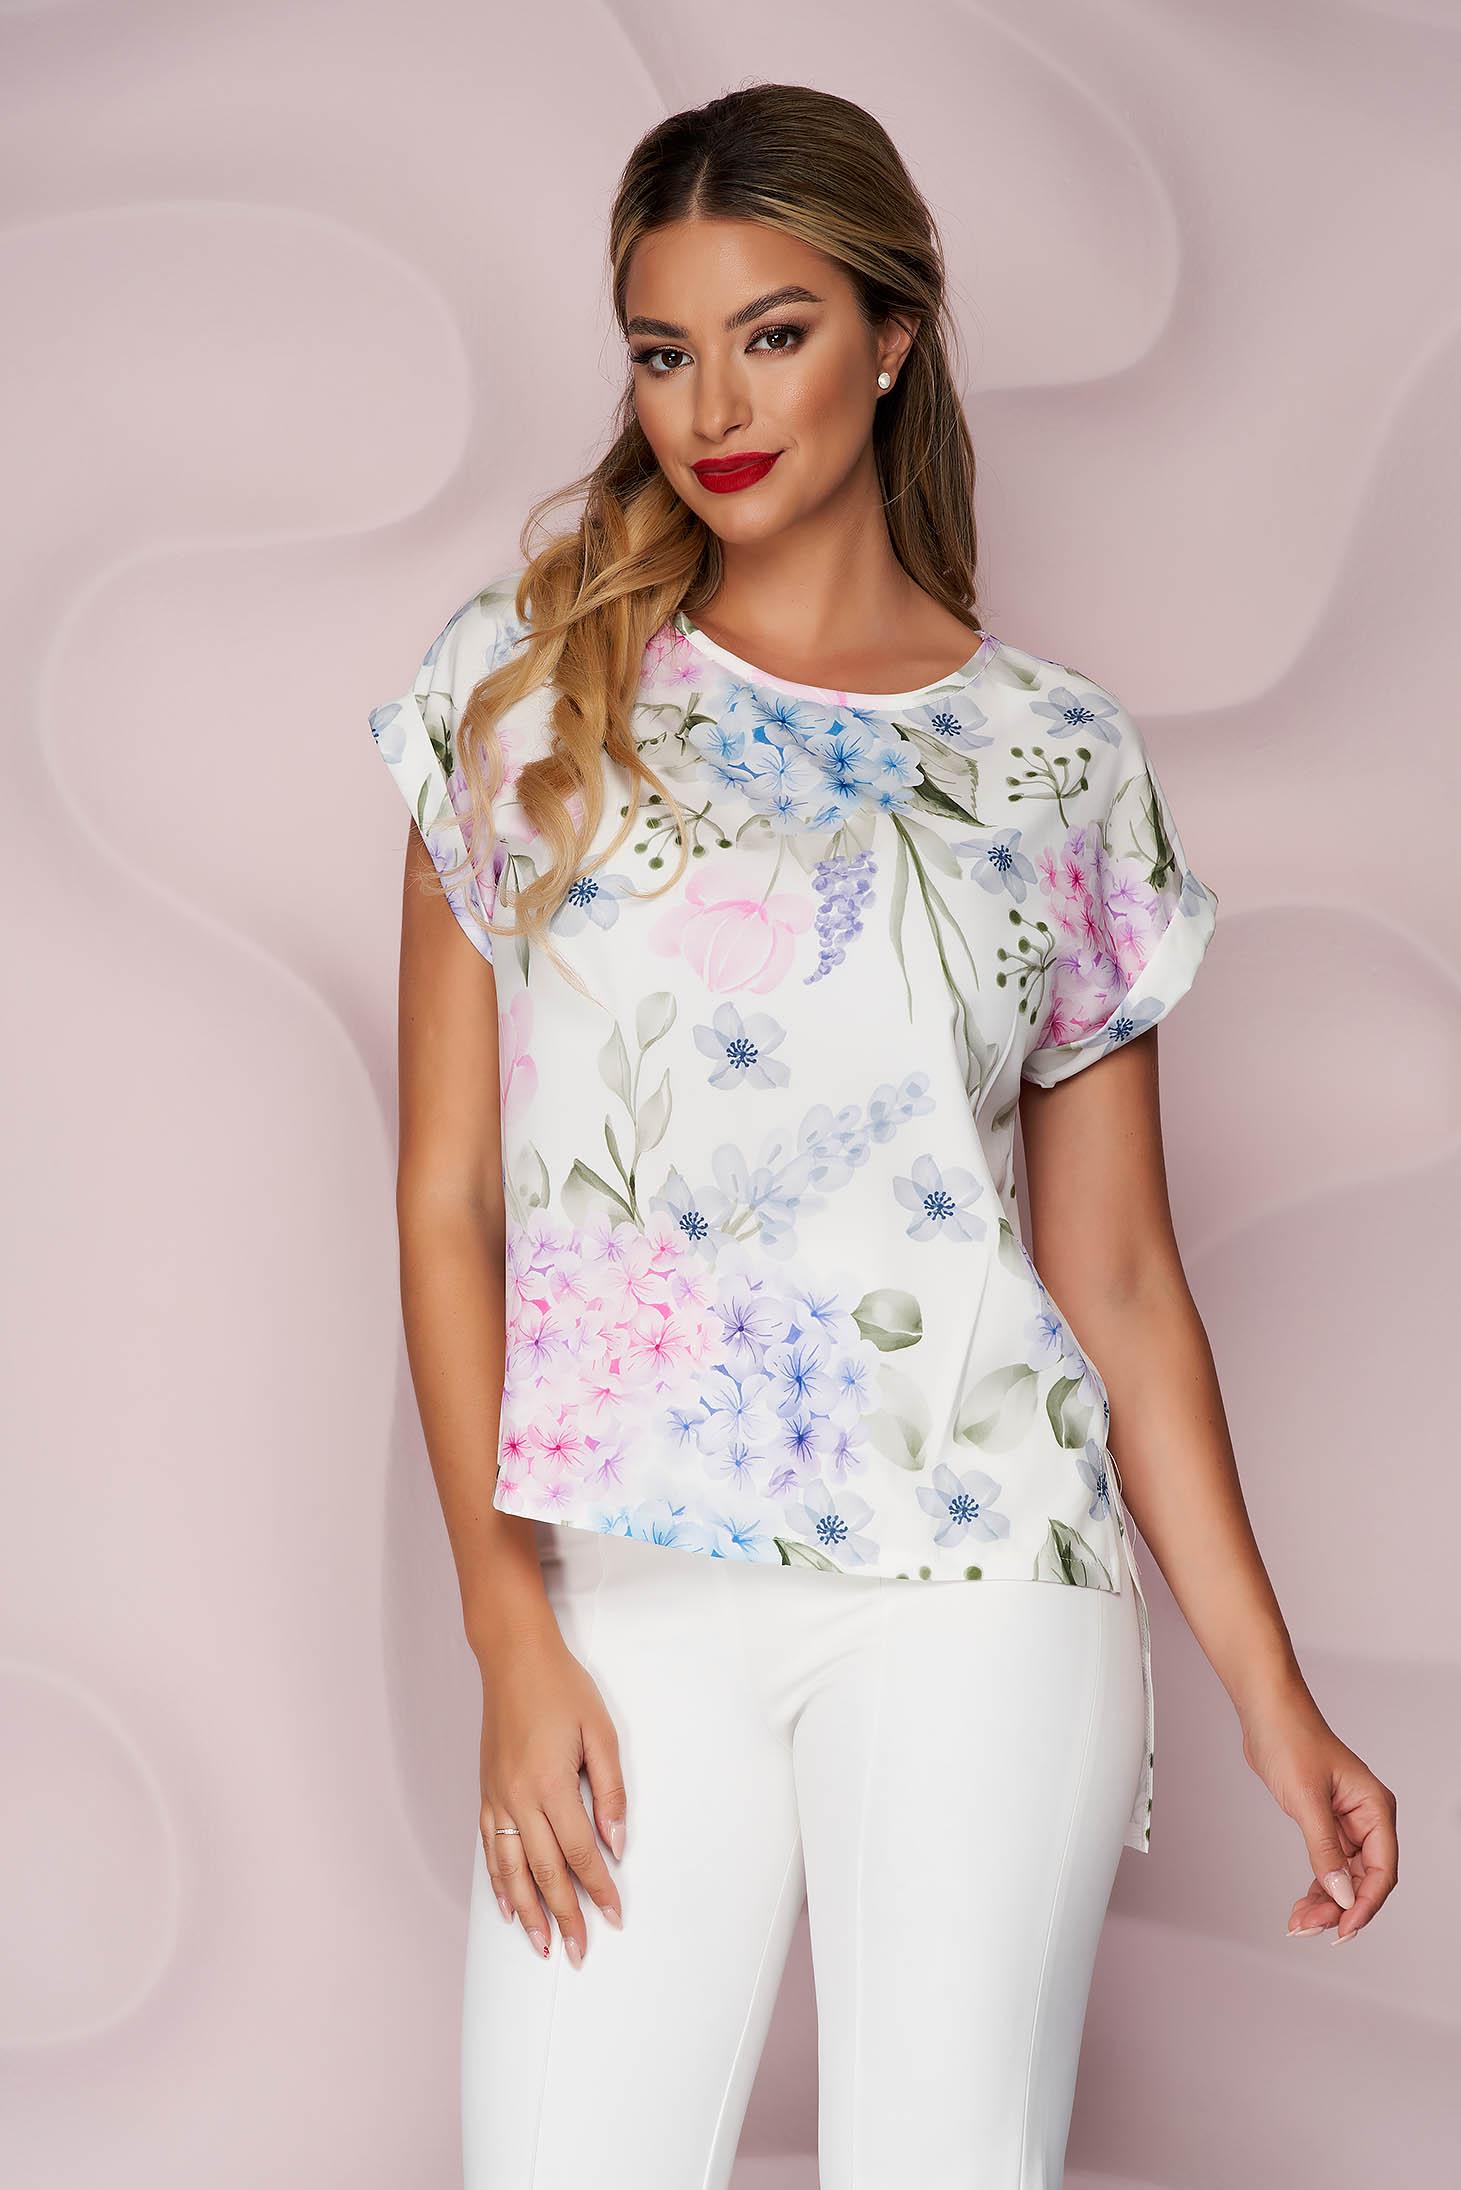 Bluza dama StarShinerS office asimetrica cu croi larg din material fin la atingere cu imprimeu floral unic